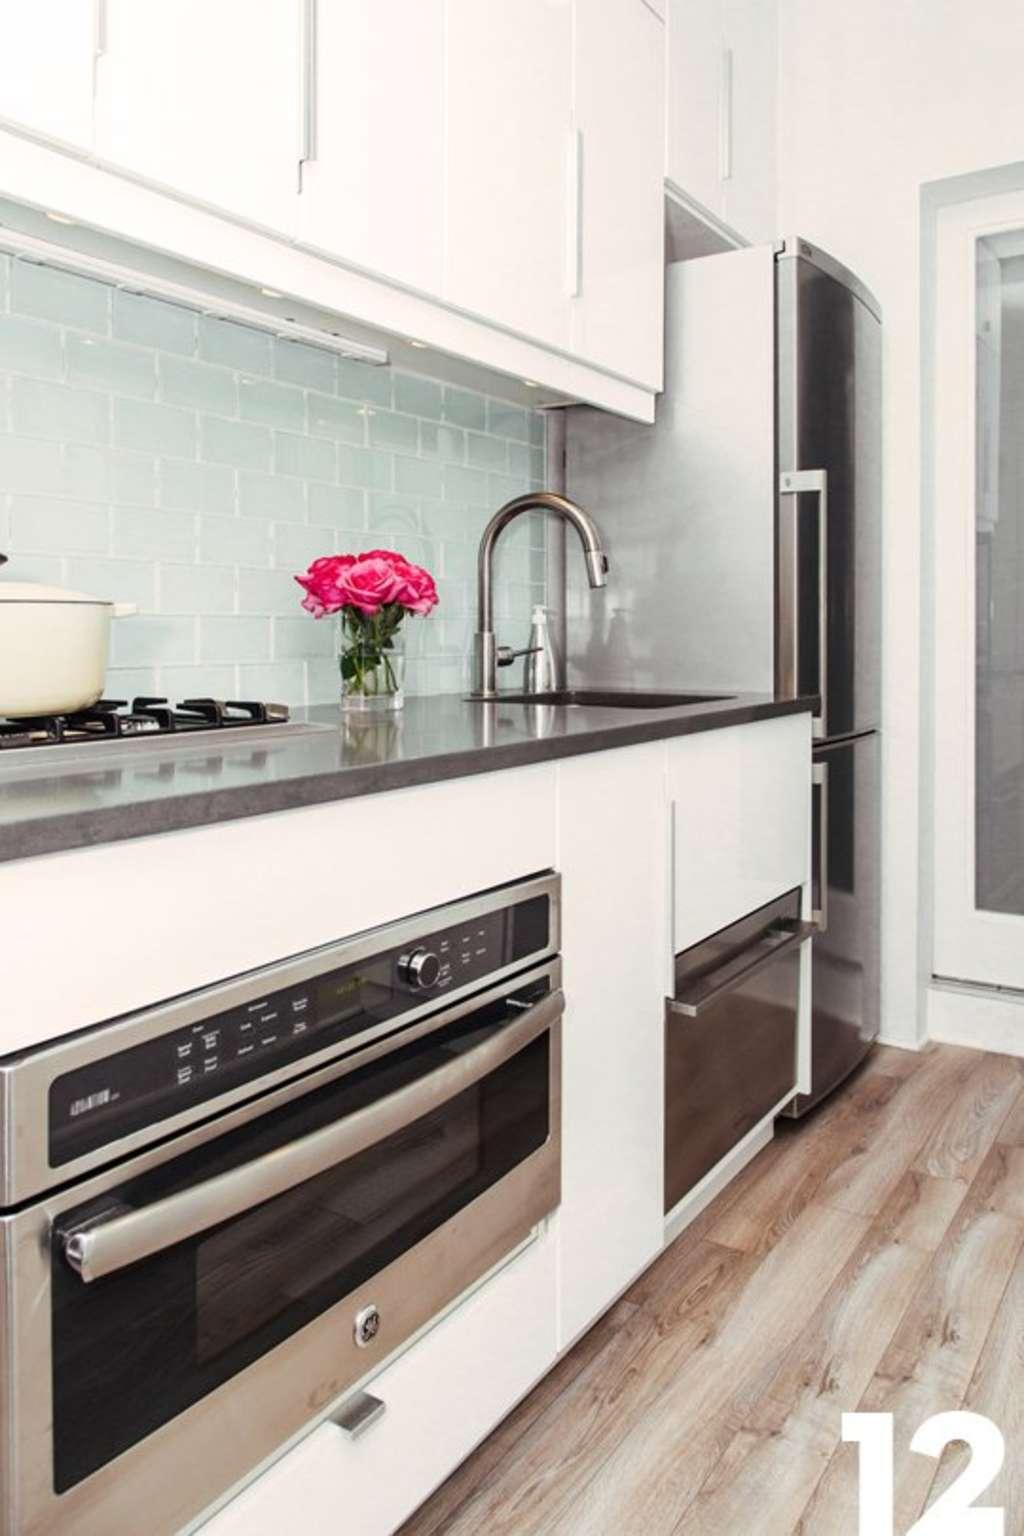 Jennifer's Kitchen Renovation: What It Really Cost